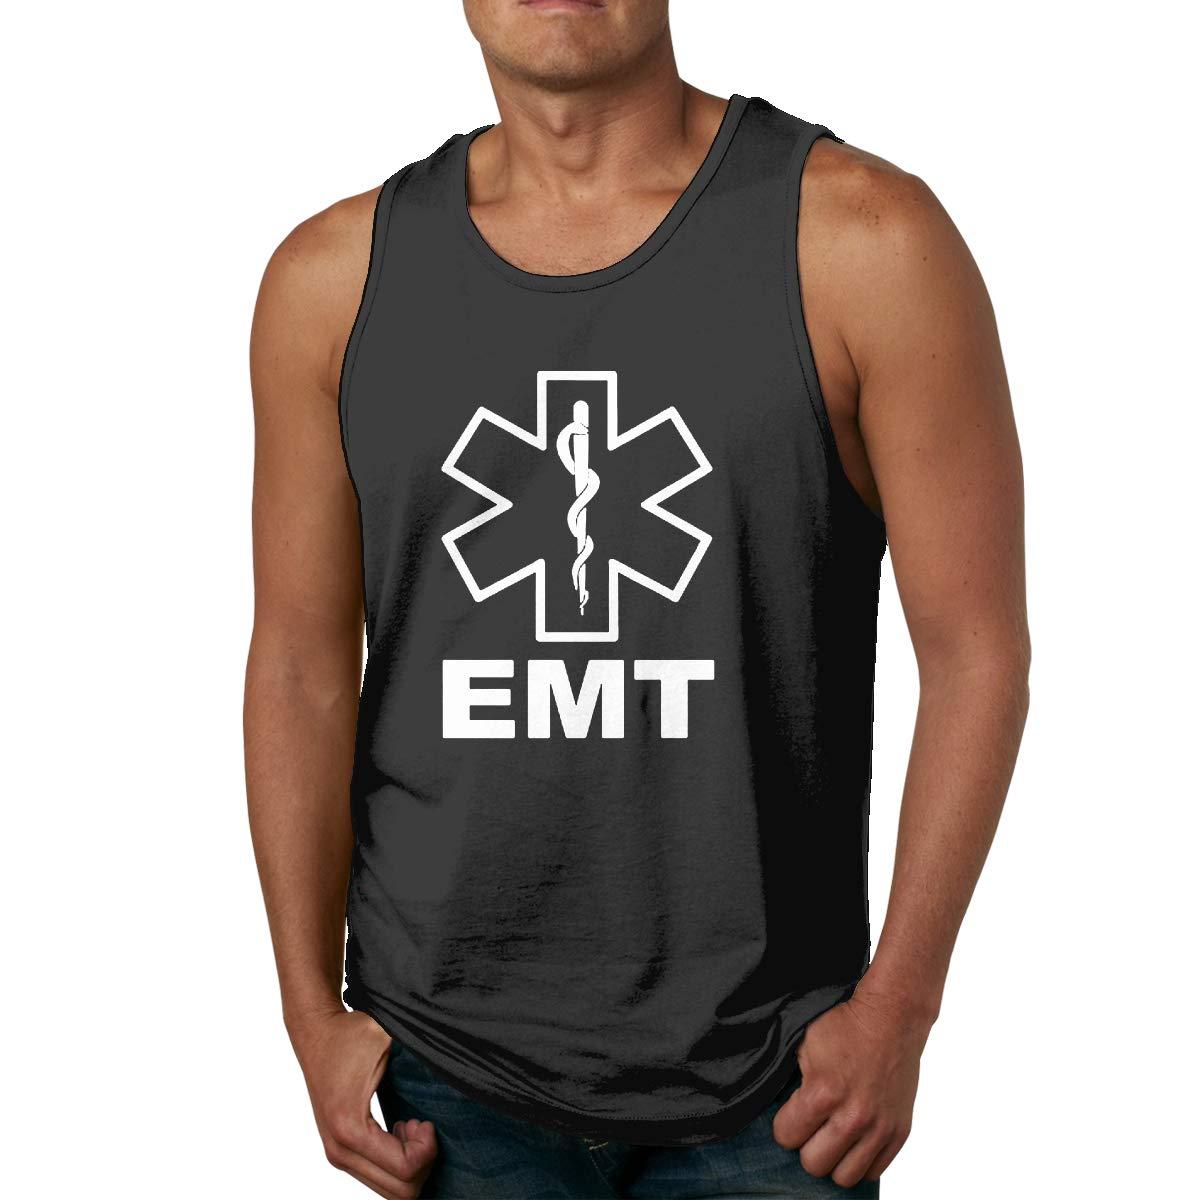 FKAHQ V2 EMT Emergency Medical Technician 911 Men Printed Vest Sports Tank-Top T-Shirt Leisure Sleeveless Shirts